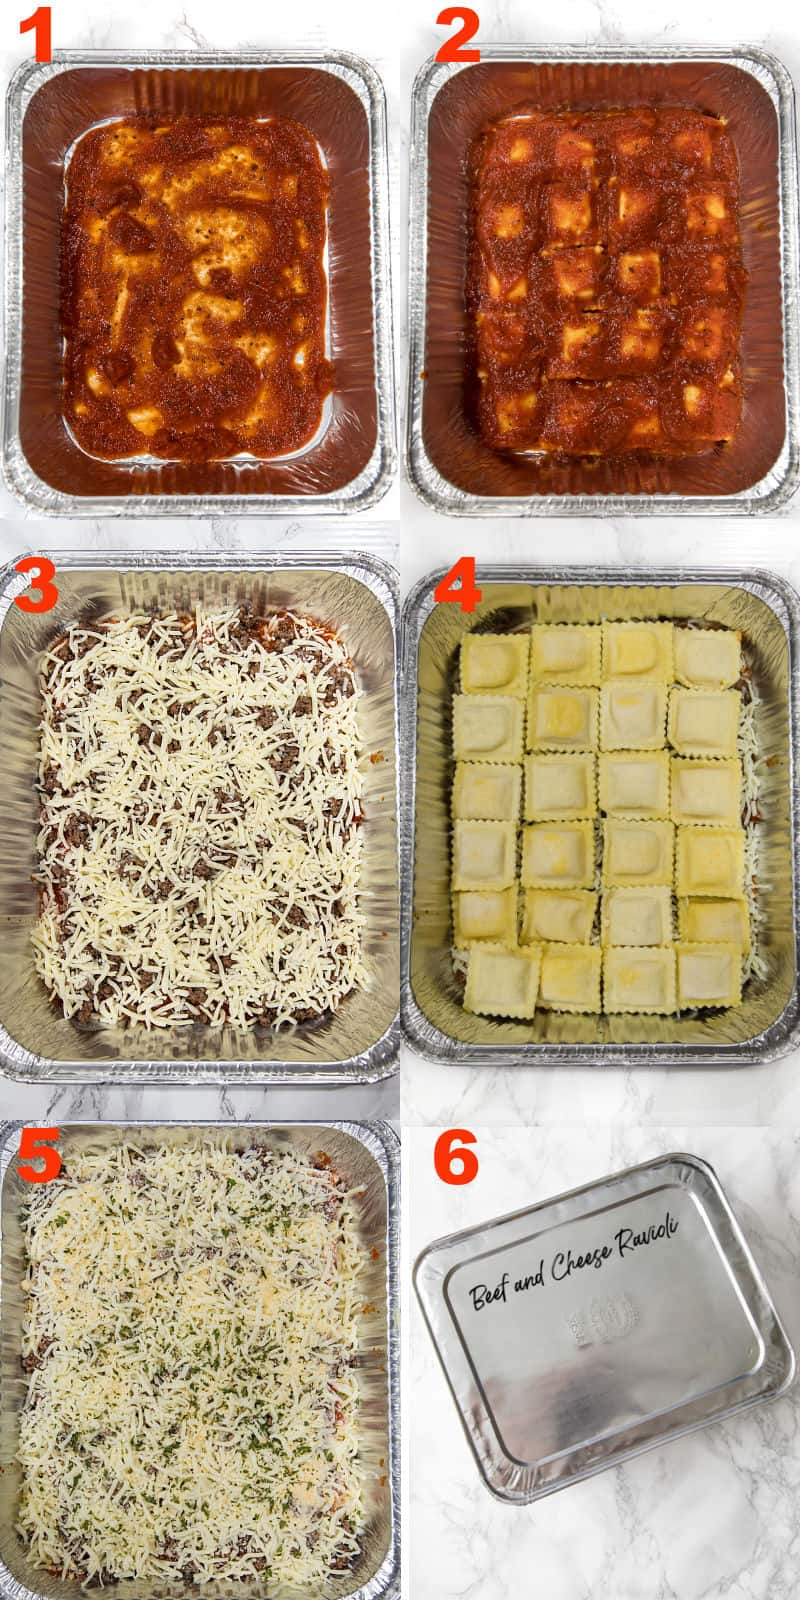 steps to make freezer ravioli in foil pan